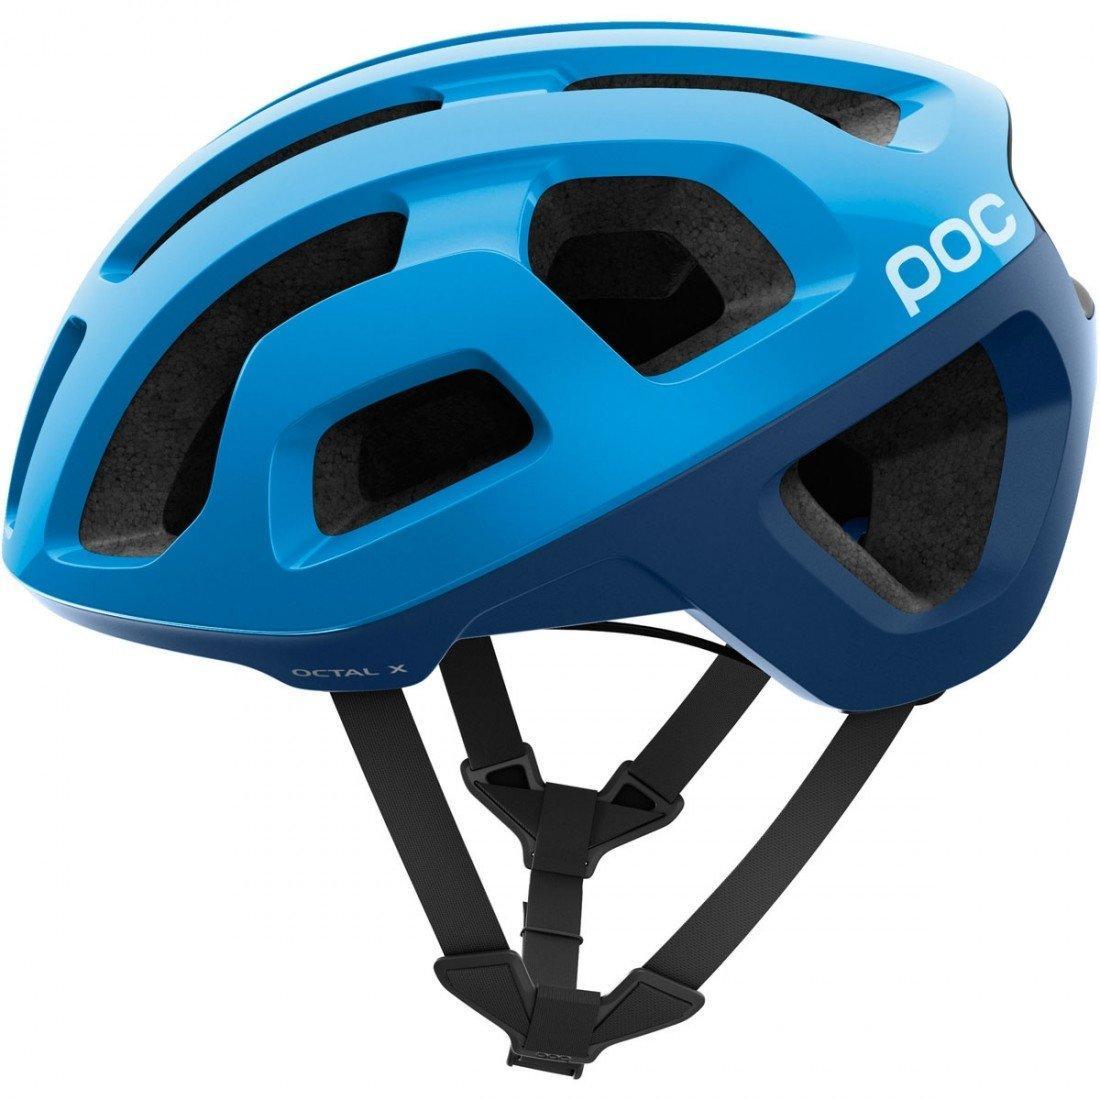 Шолом велосипедний POC Octal X Spin S 50-56 Furfural Blue